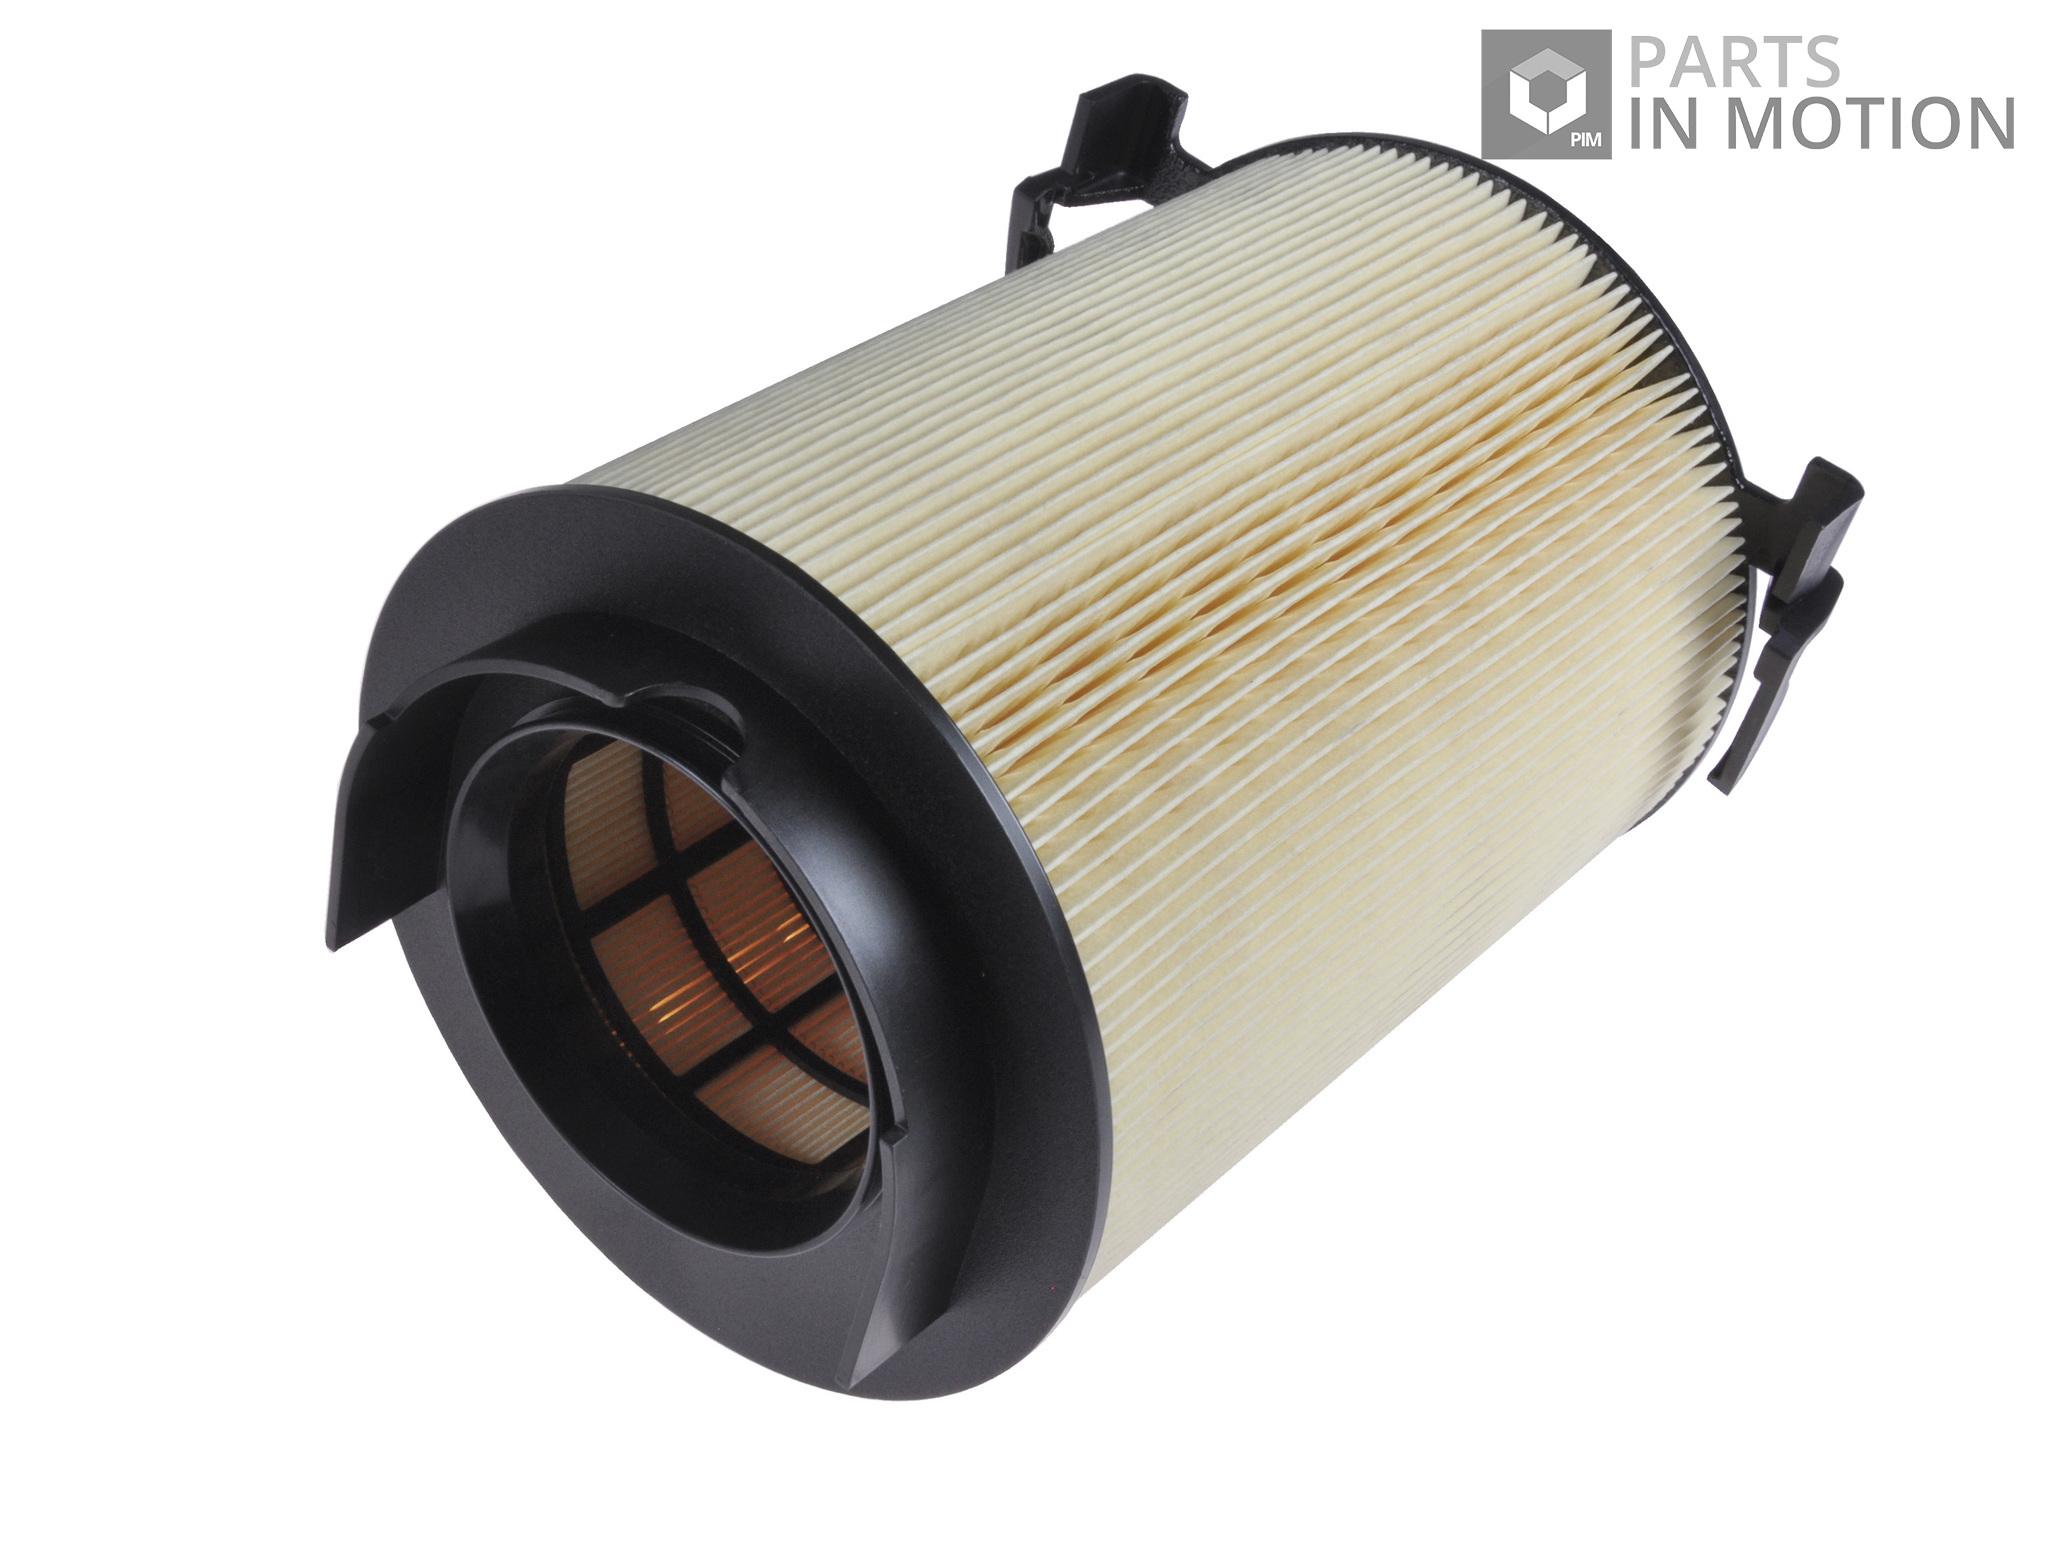 Fits Seat Leon 1P1 1.2 TSi Genuine Borg /& Beck Engine Air Filter